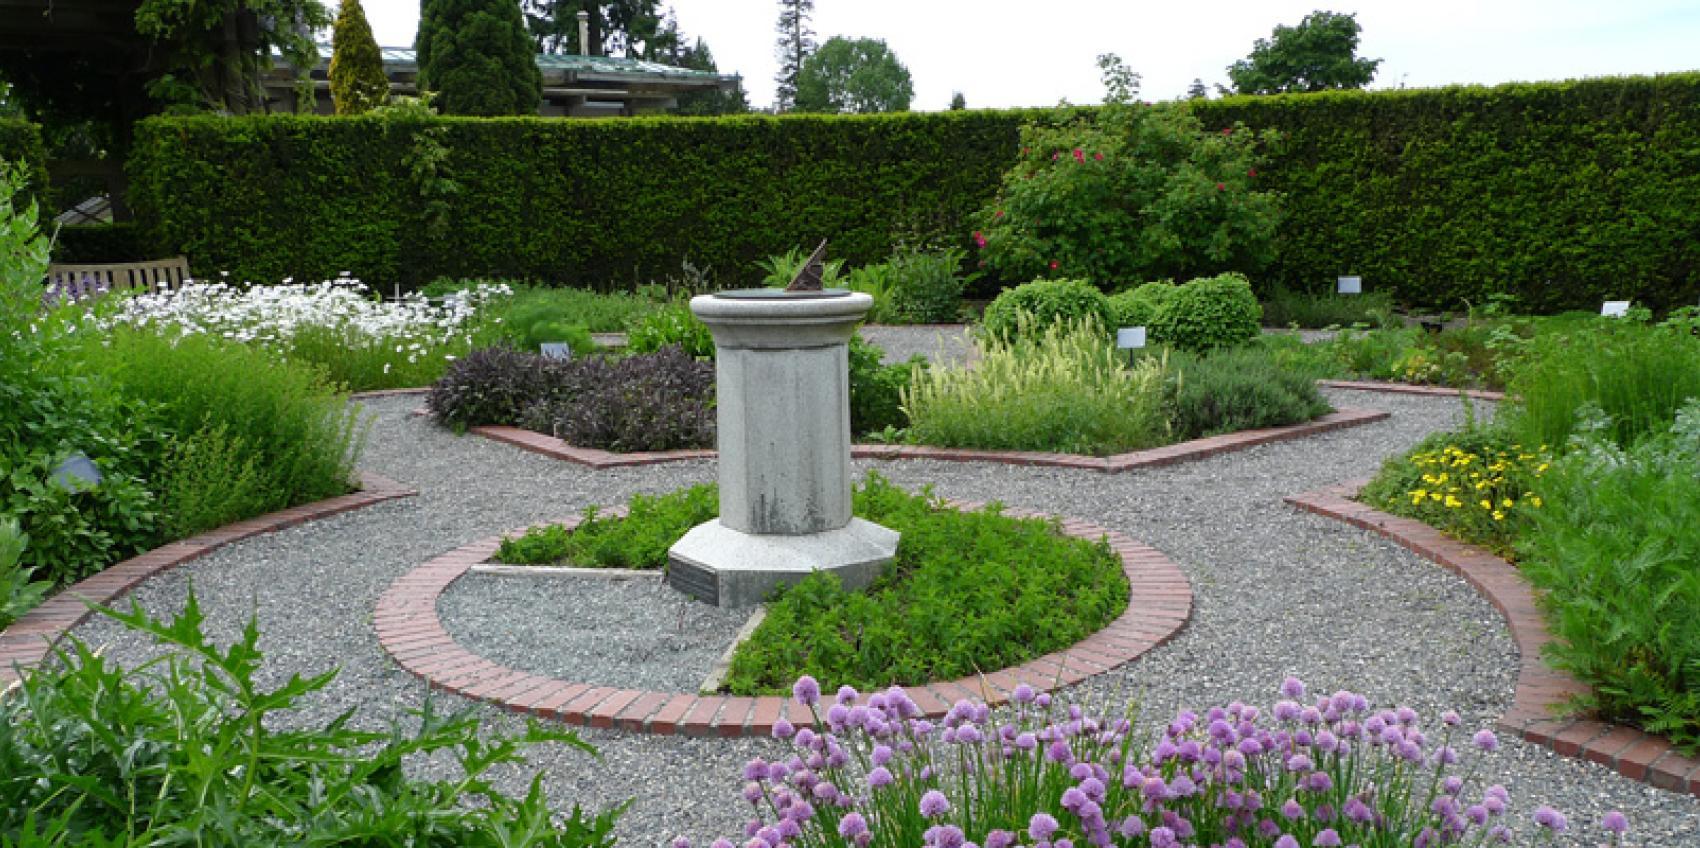 University Of British Columbia Botanical Garden American Public Gardens Association